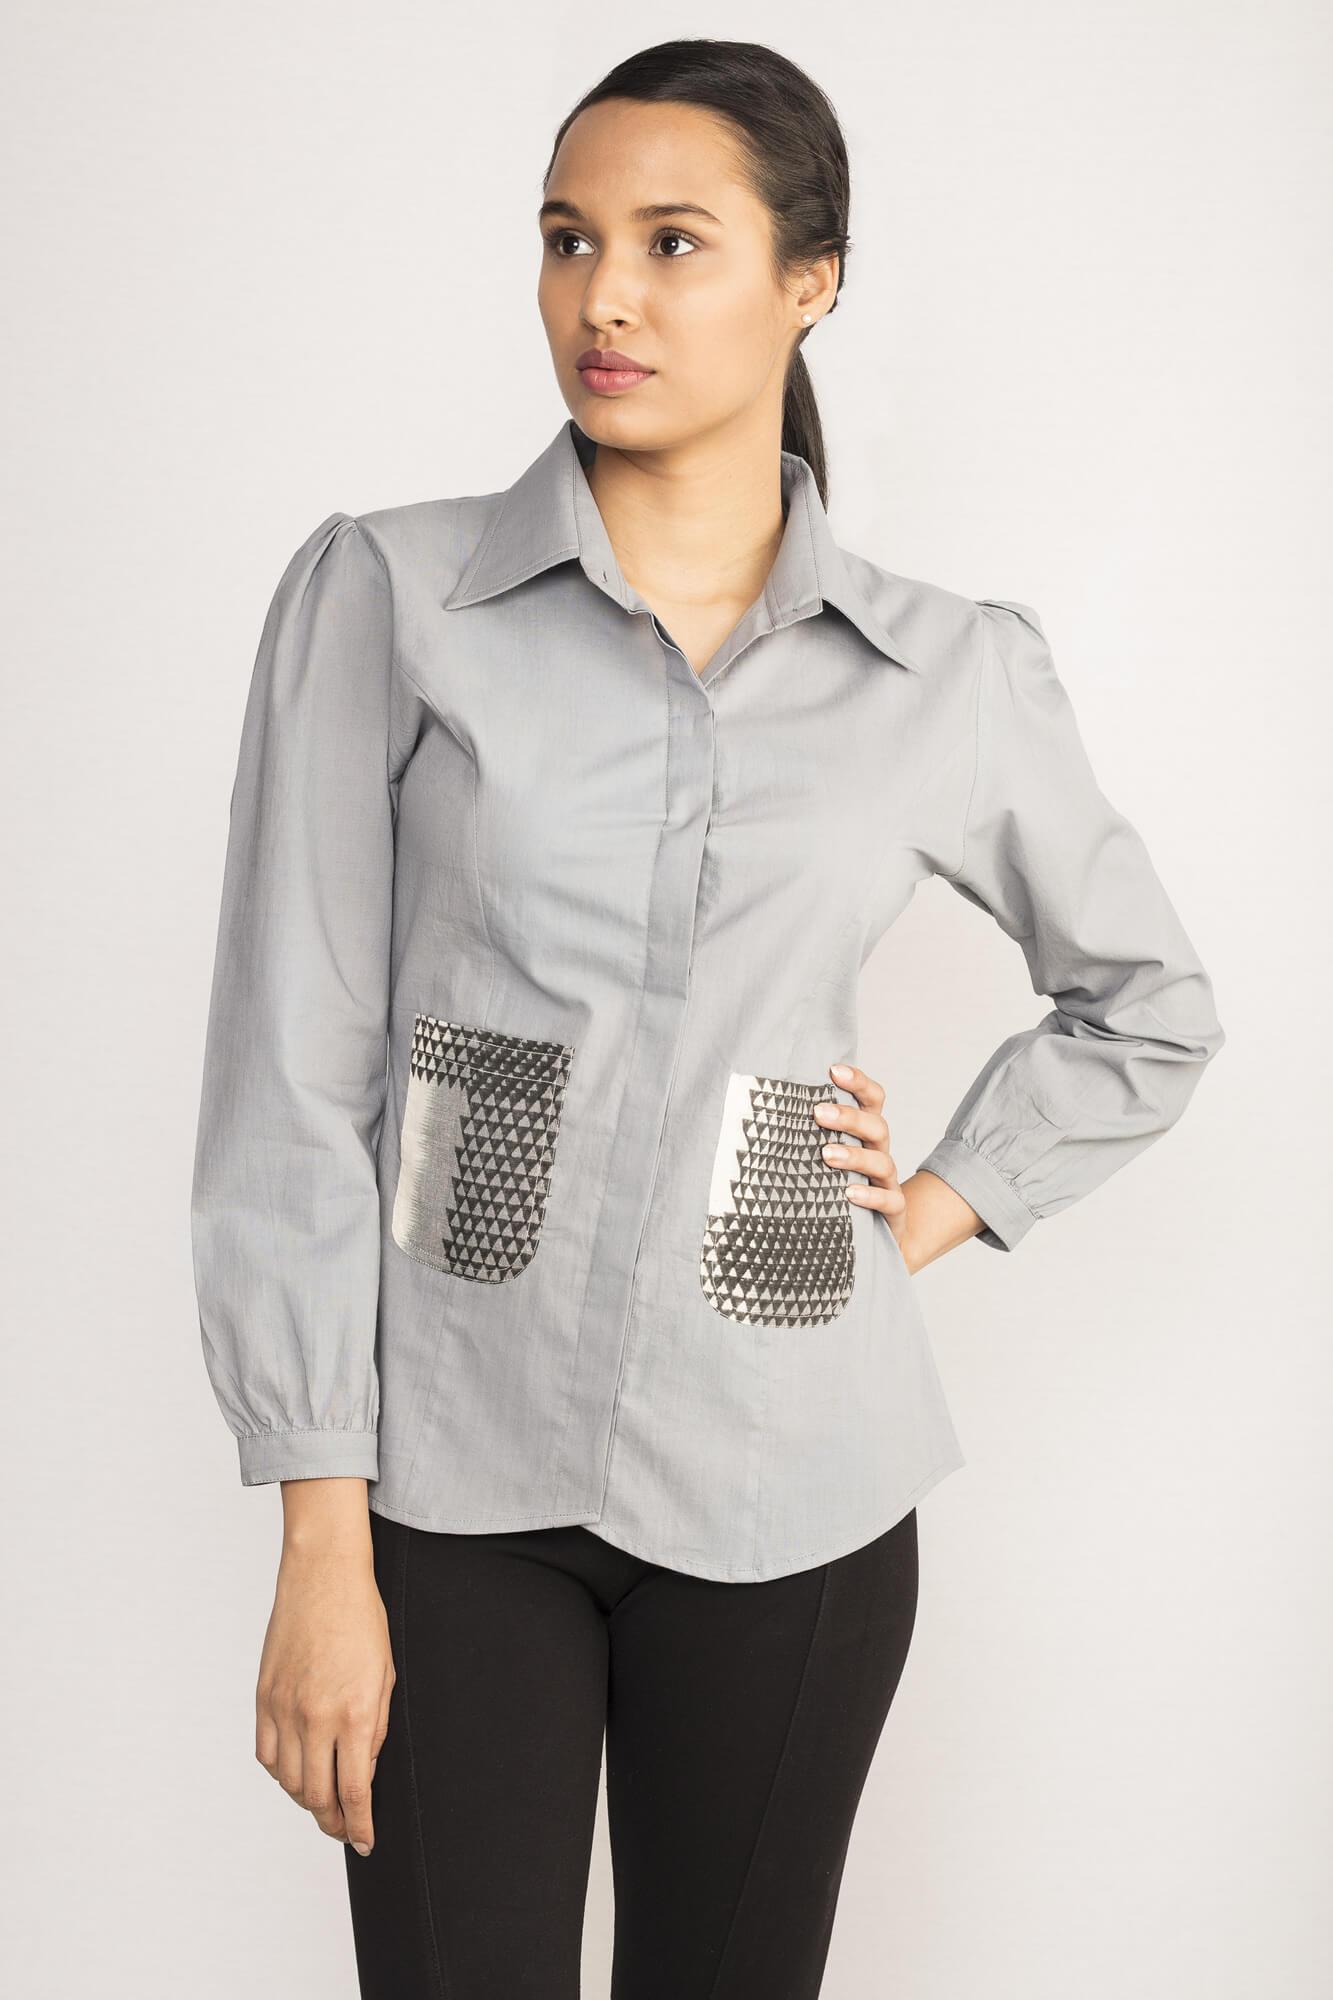 Grey Patch Pocket Shirt By TAMASQ